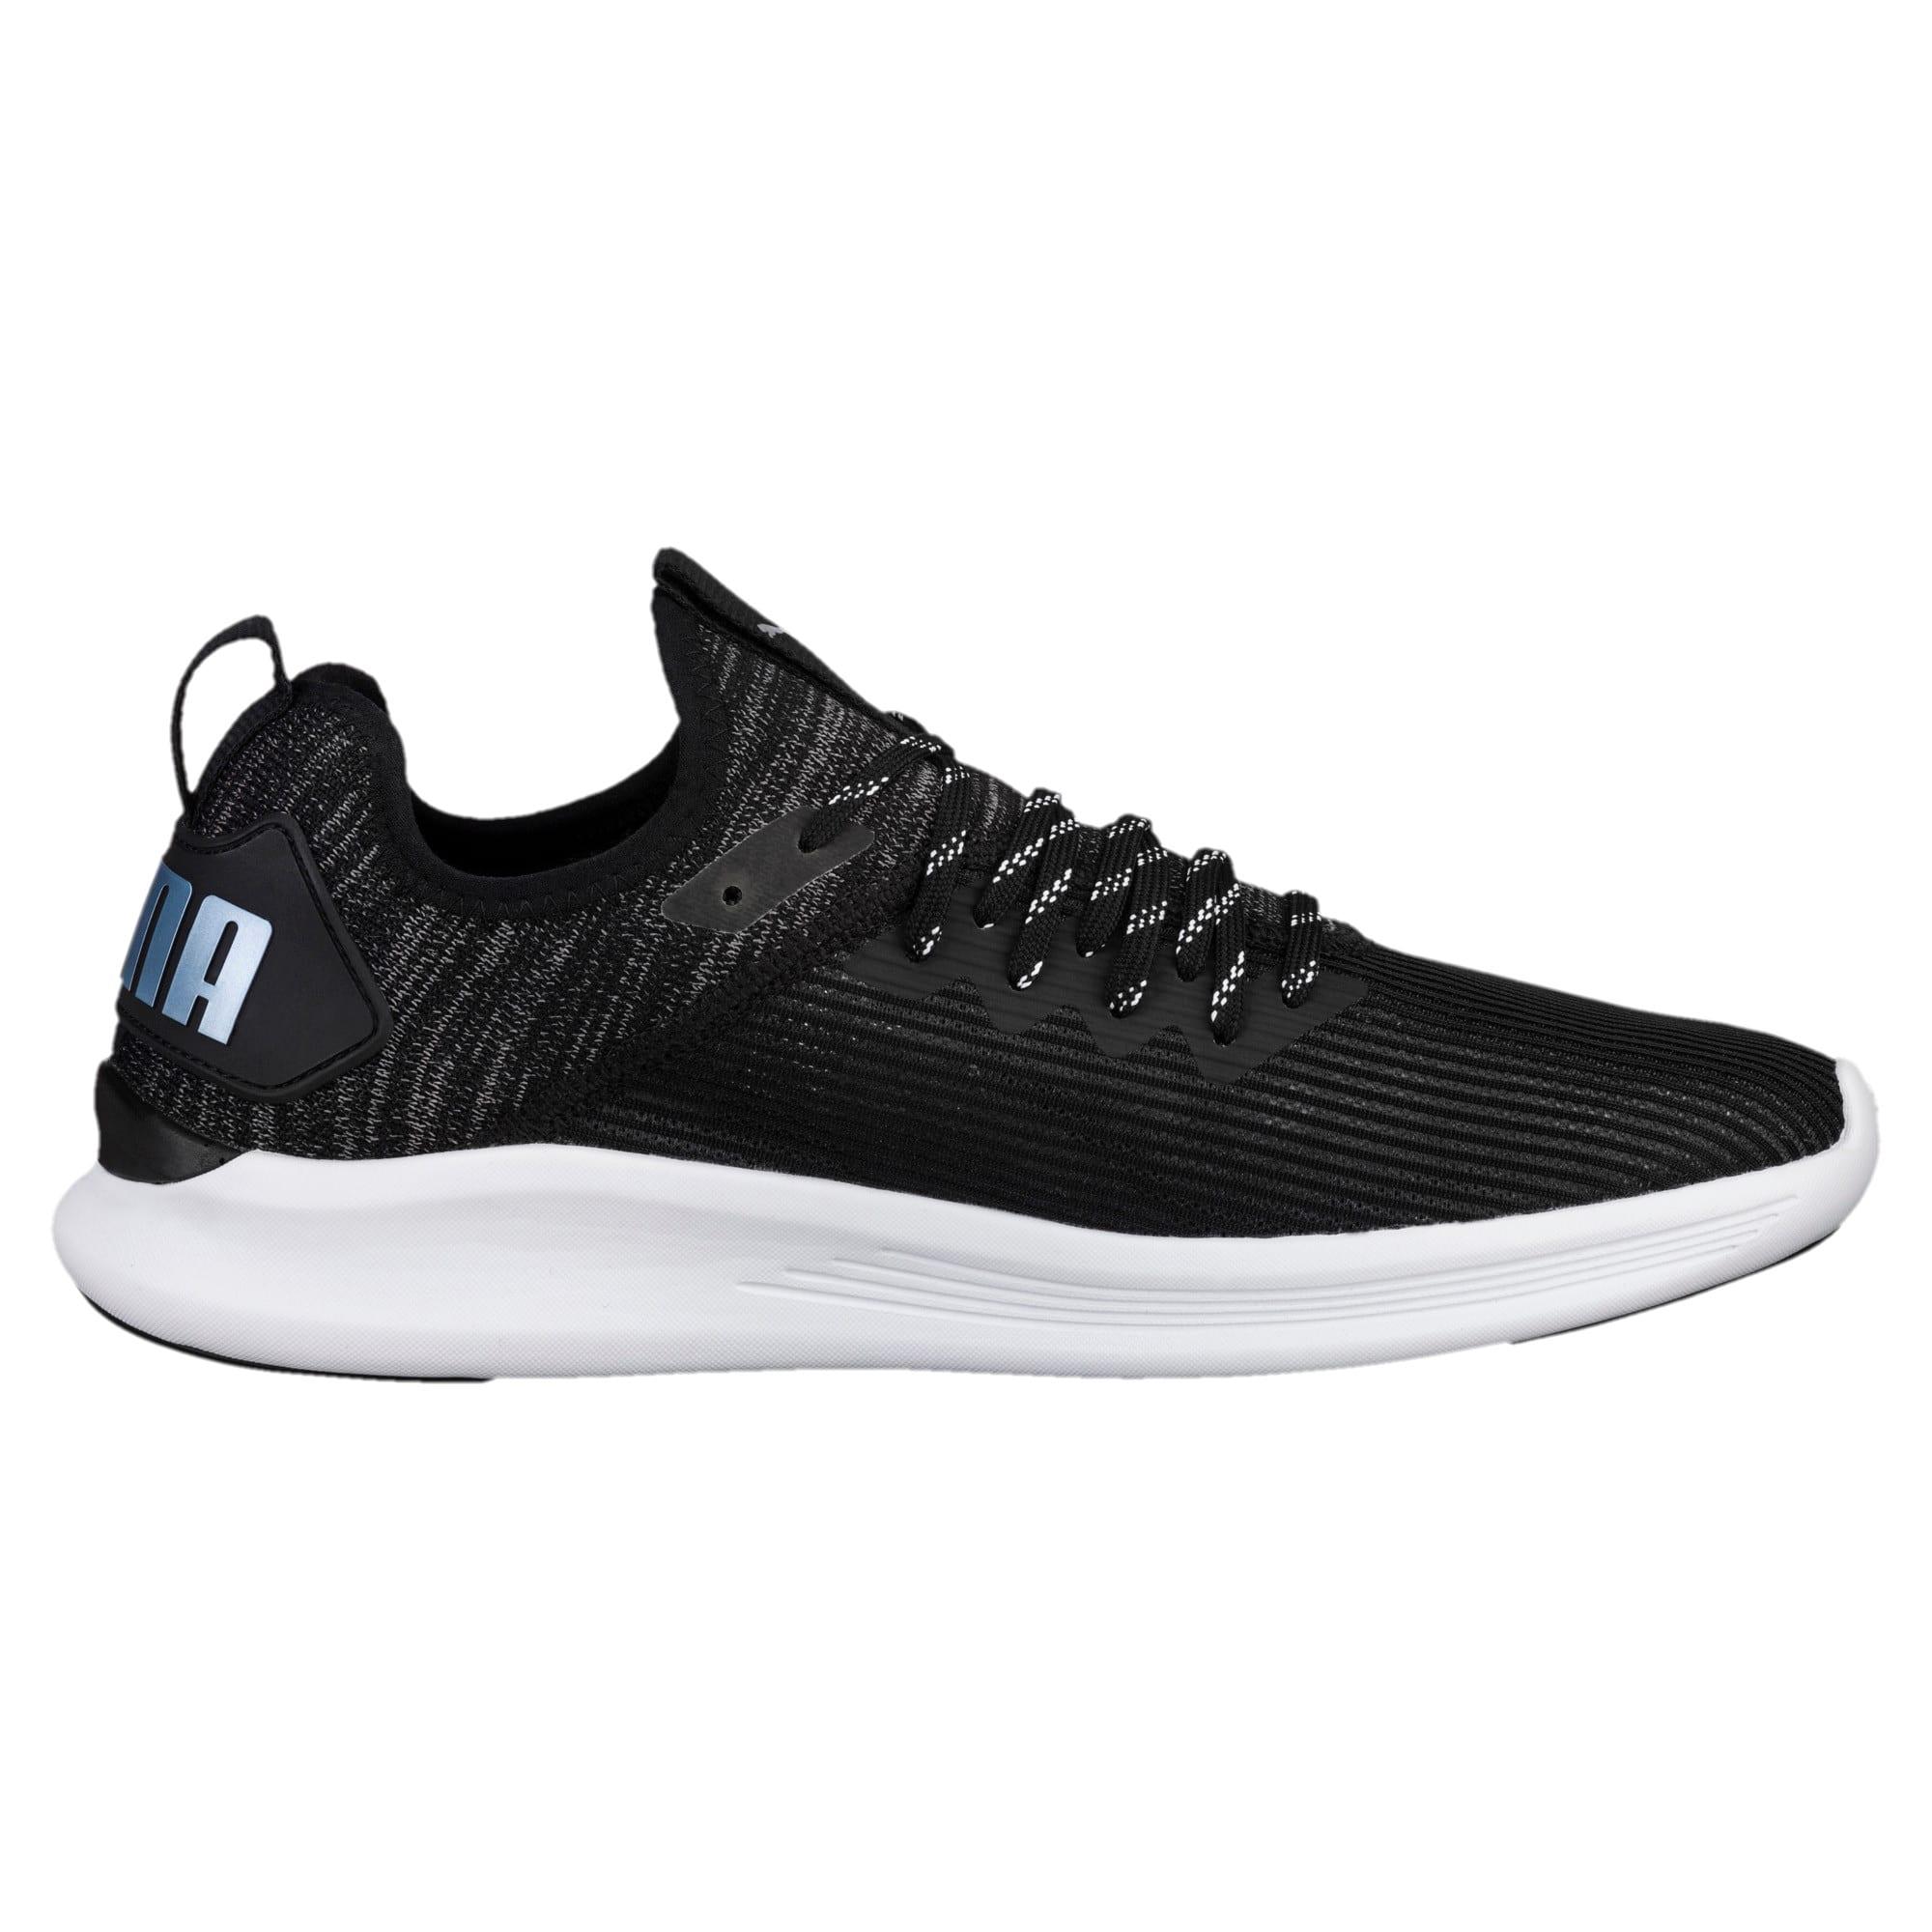 Thumbnail 4 of IGNITE Flash Stripped Men's Running Shoes, Puma Black-QUIET SHADE, medium-IND